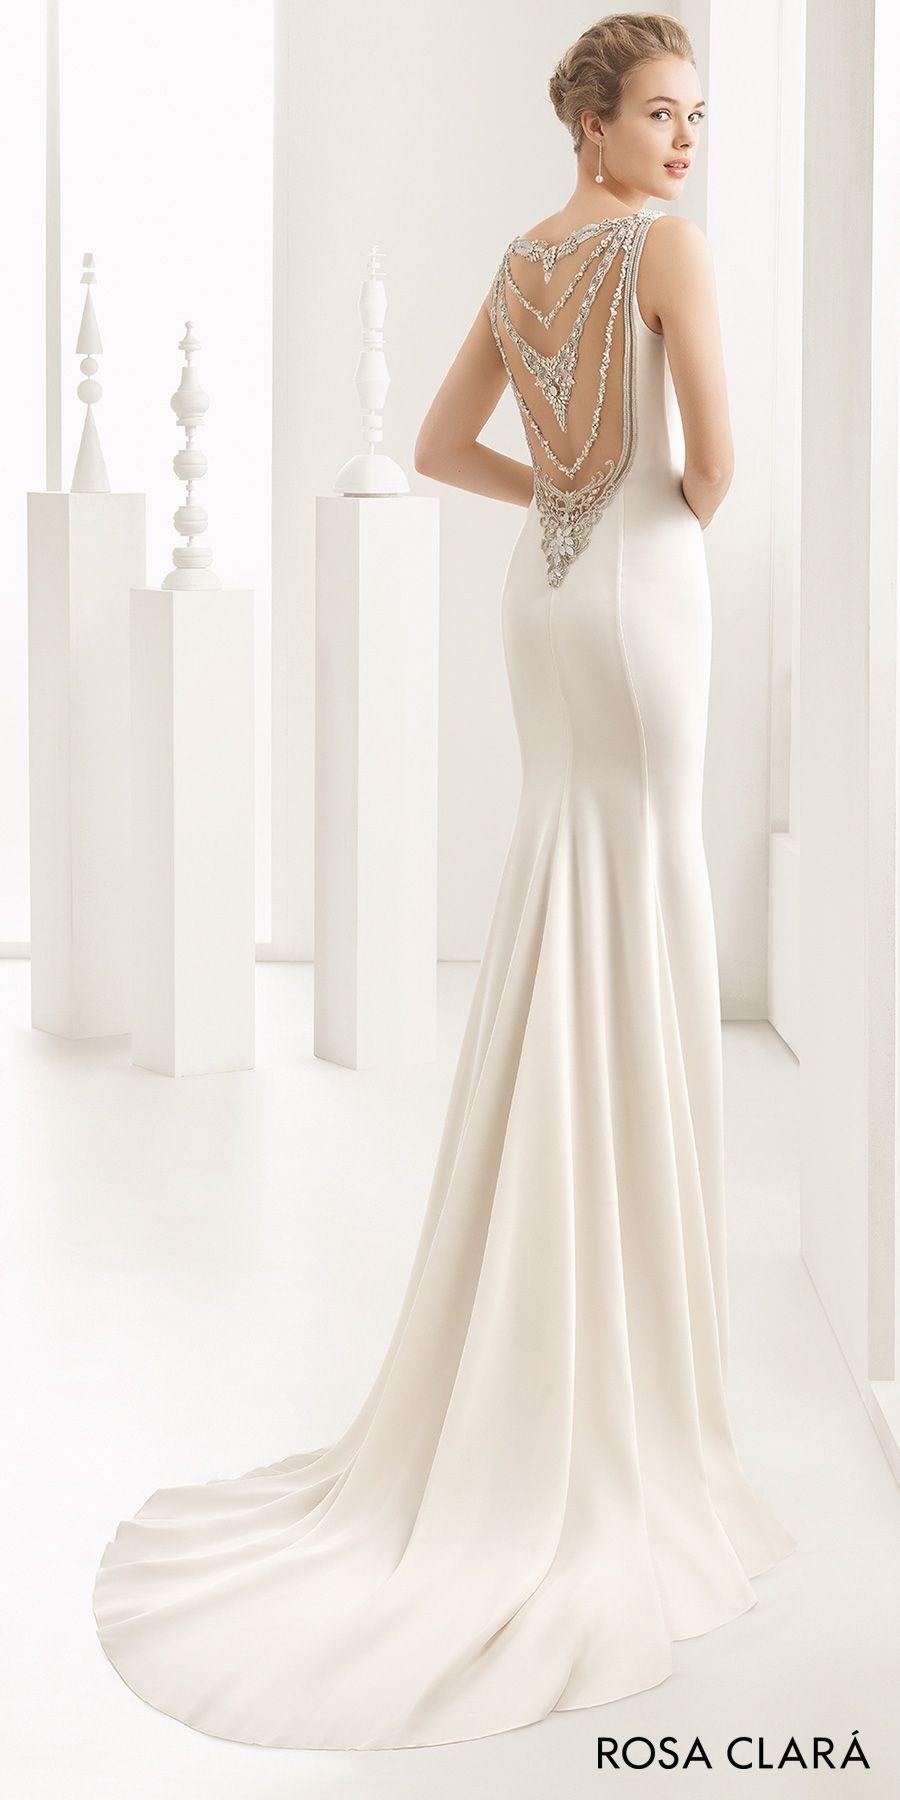 Rosa Clara 2017 Bridal Collection These Wedding Dresses Feature Unforgettable Details Wedding Inspirasi Wedding Dresses Wedding Dresses Simple Elegant Wedding Dress